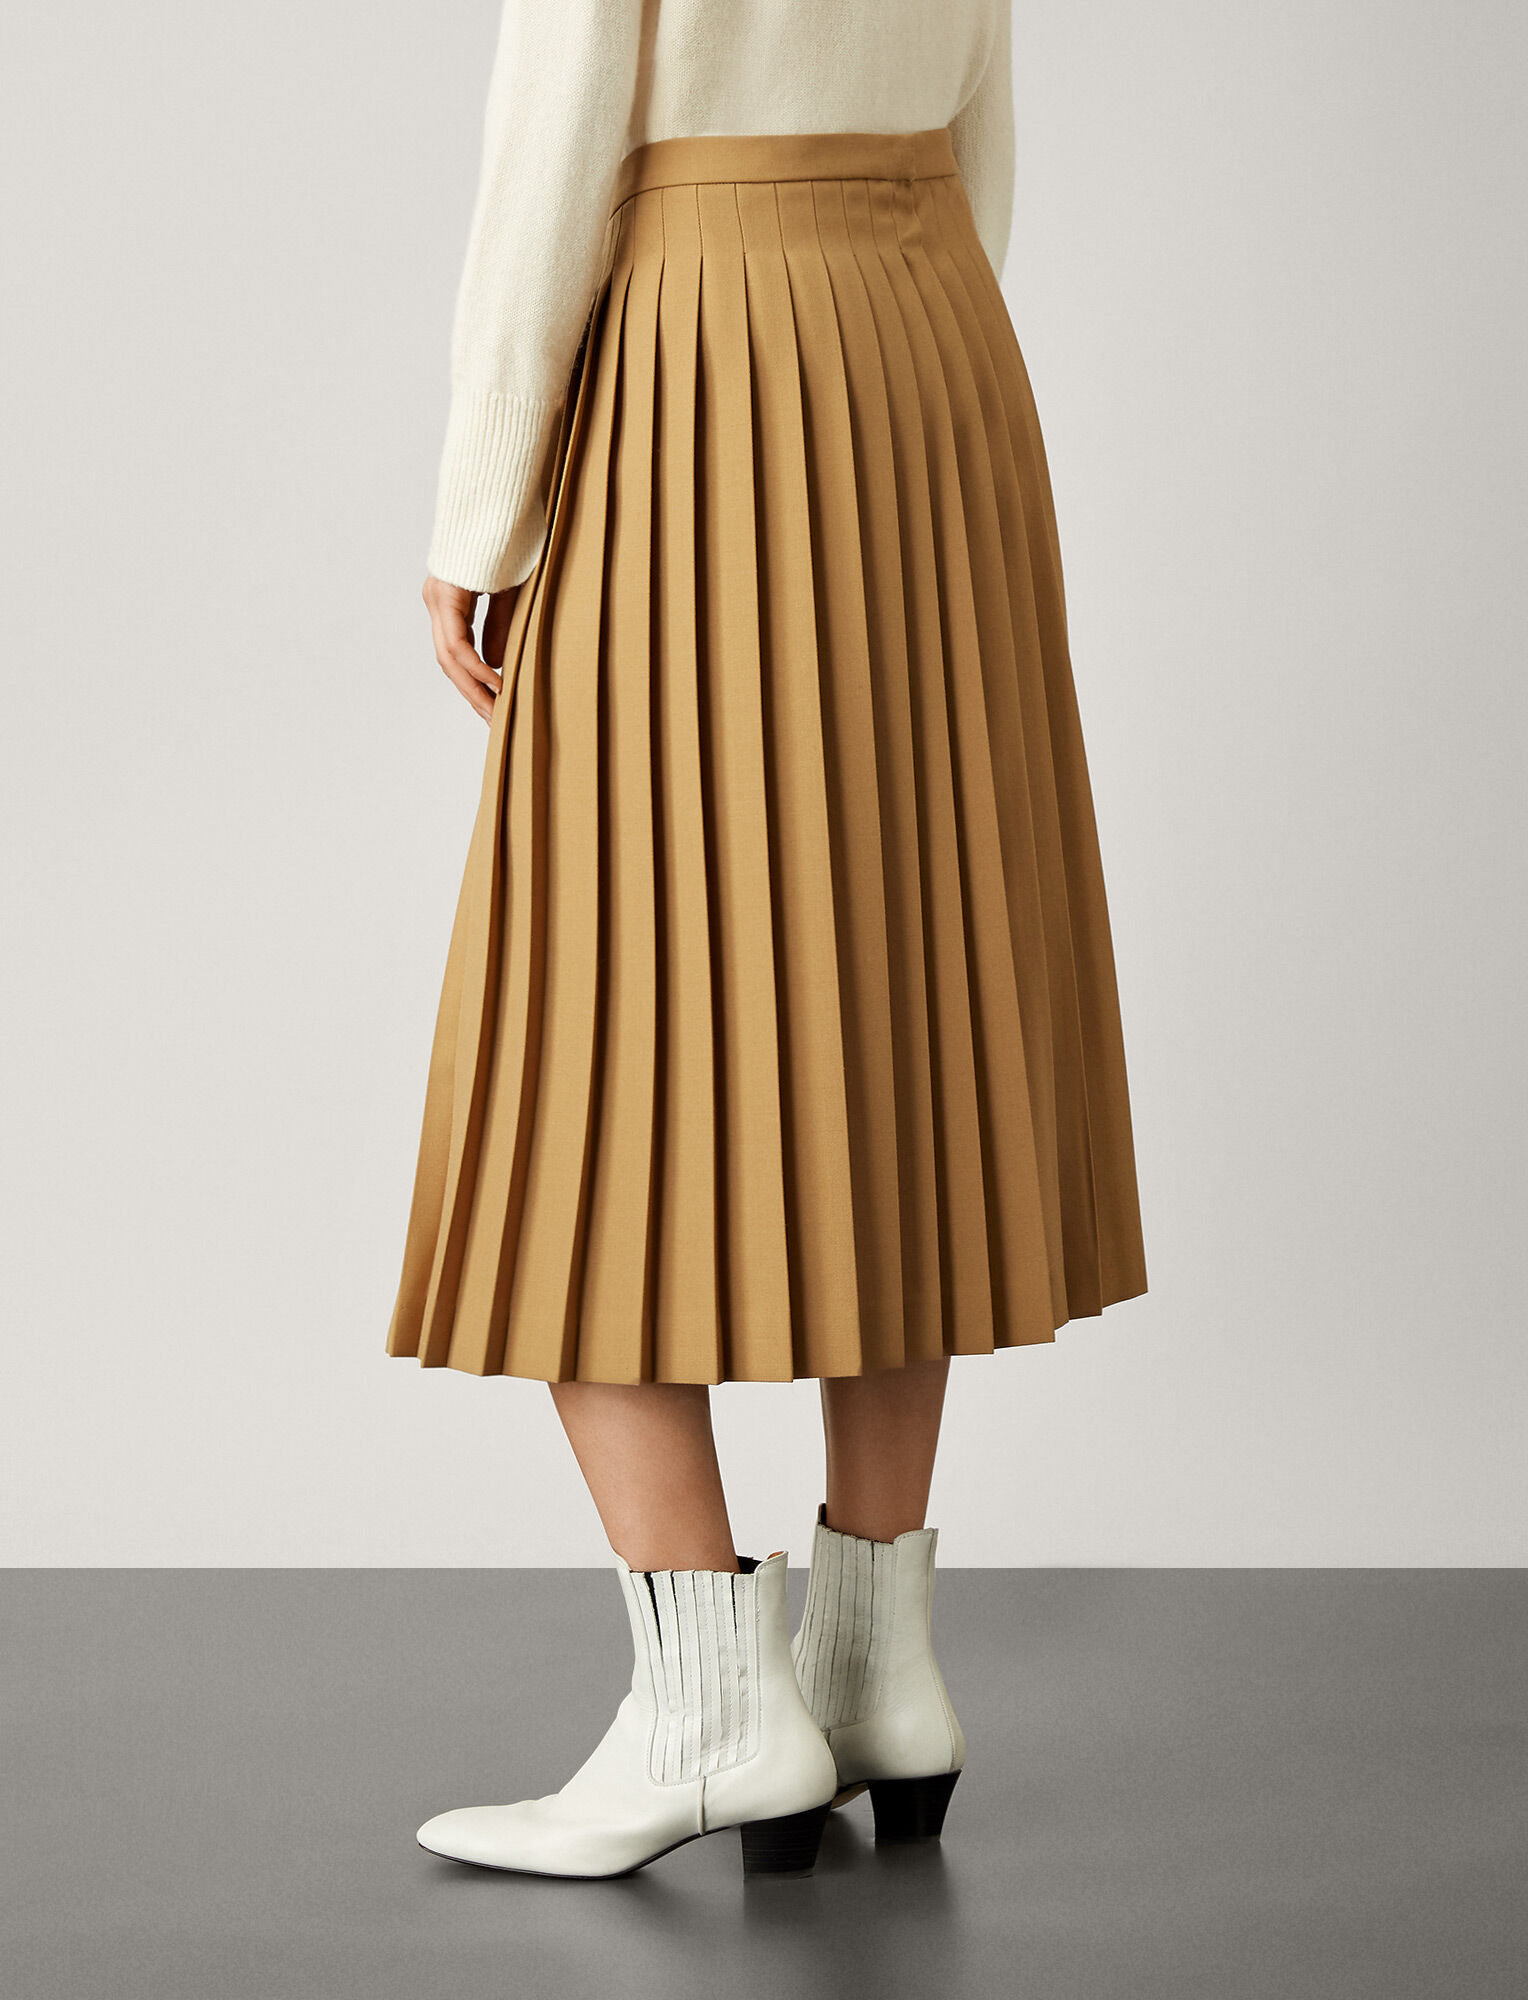 Joseph, Malvyn Wool Granite Skirt, in CAMEL